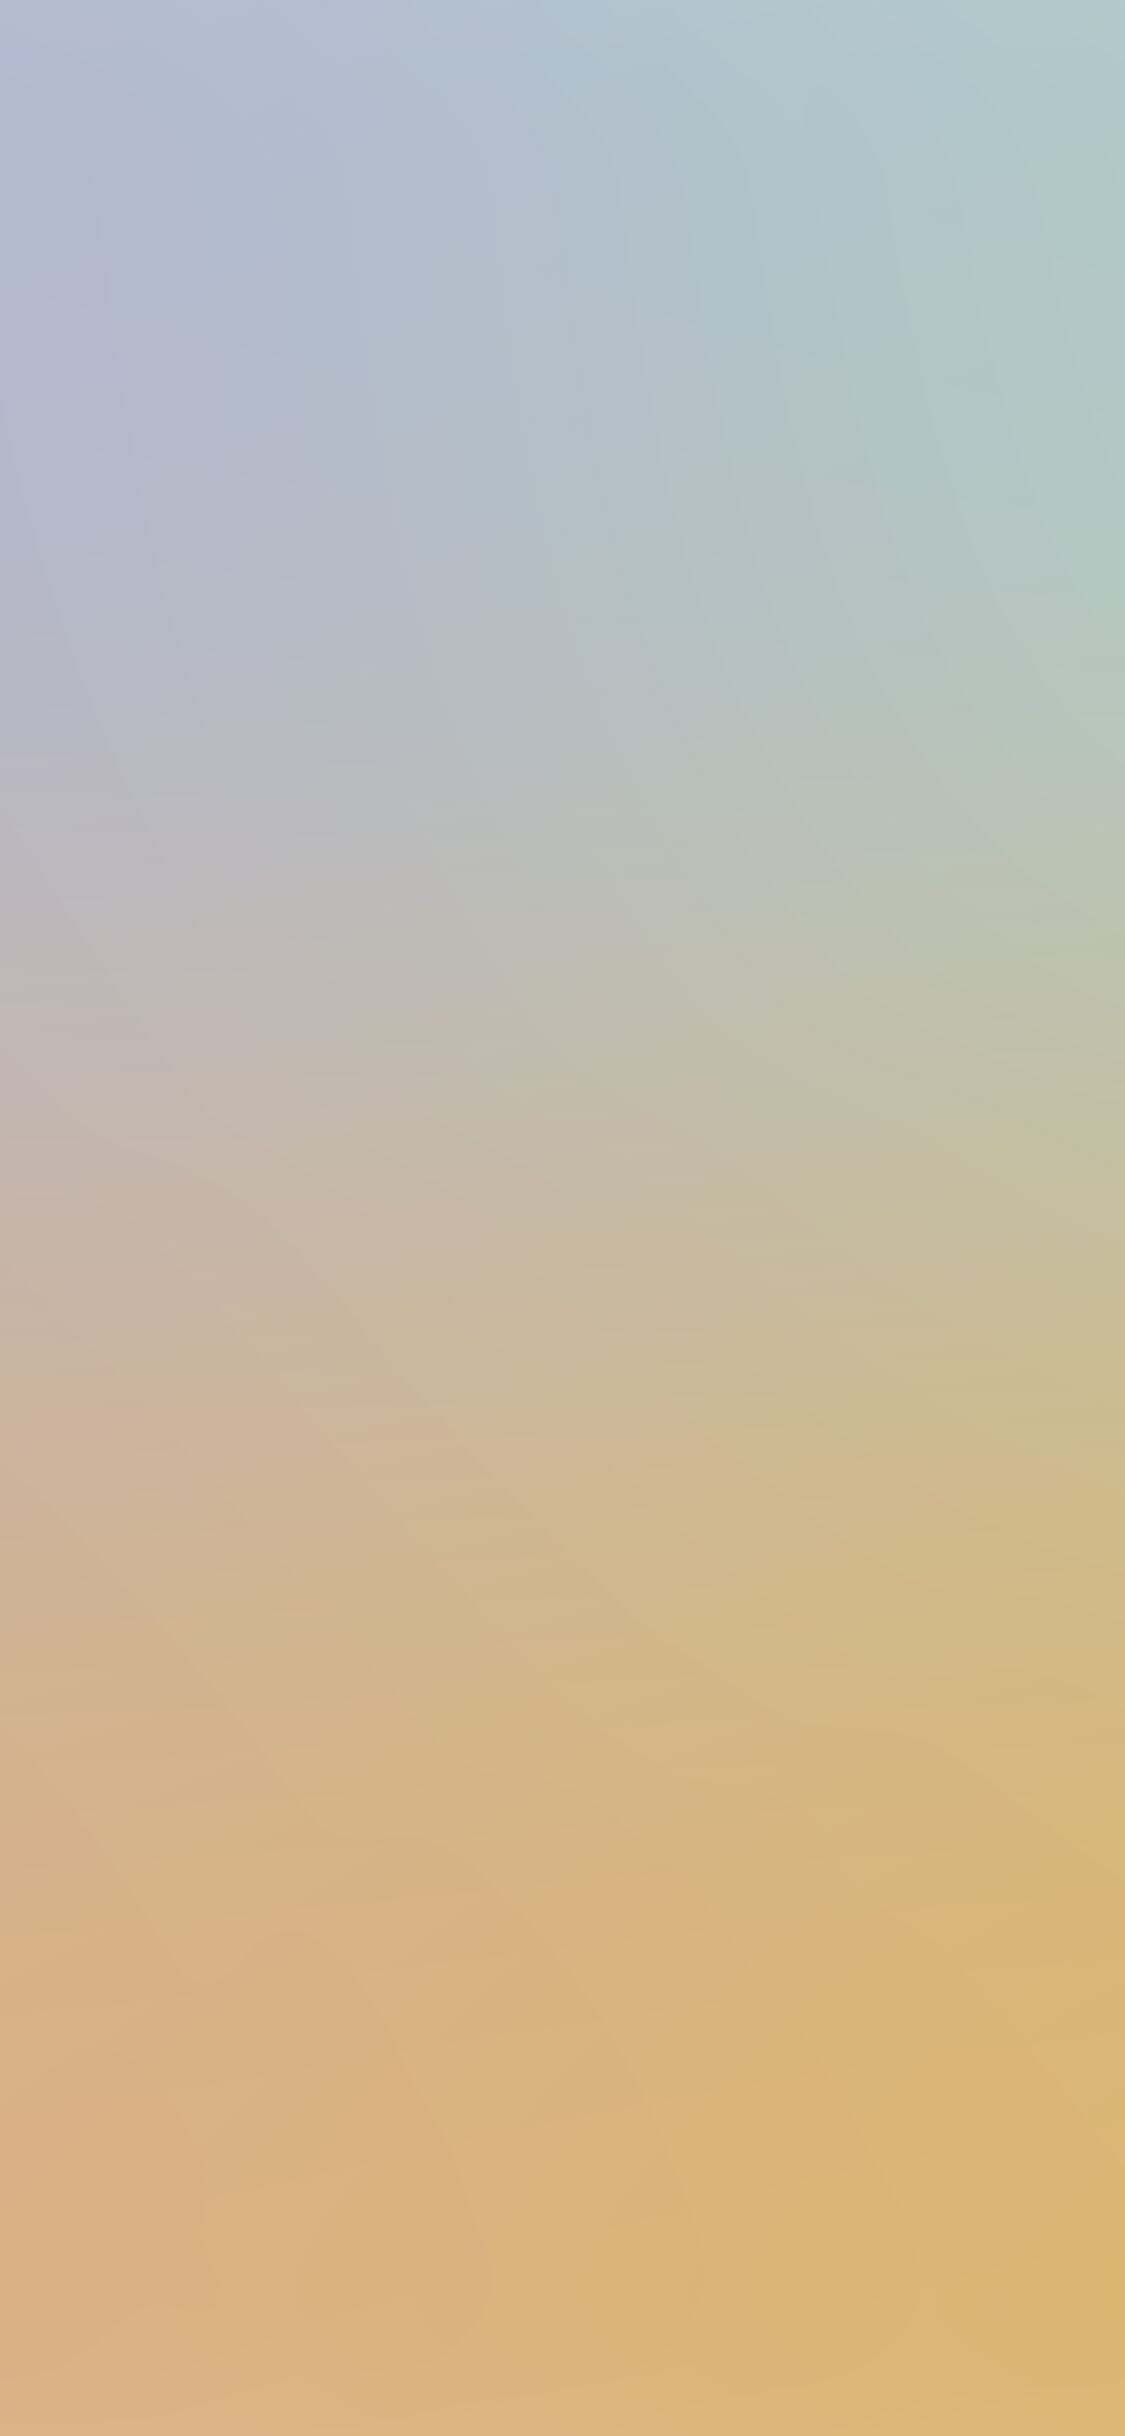 iPhonexpapers.com-Apple-iPhone-wallpaper-sm14-orange-green-pueple-blur-gradation